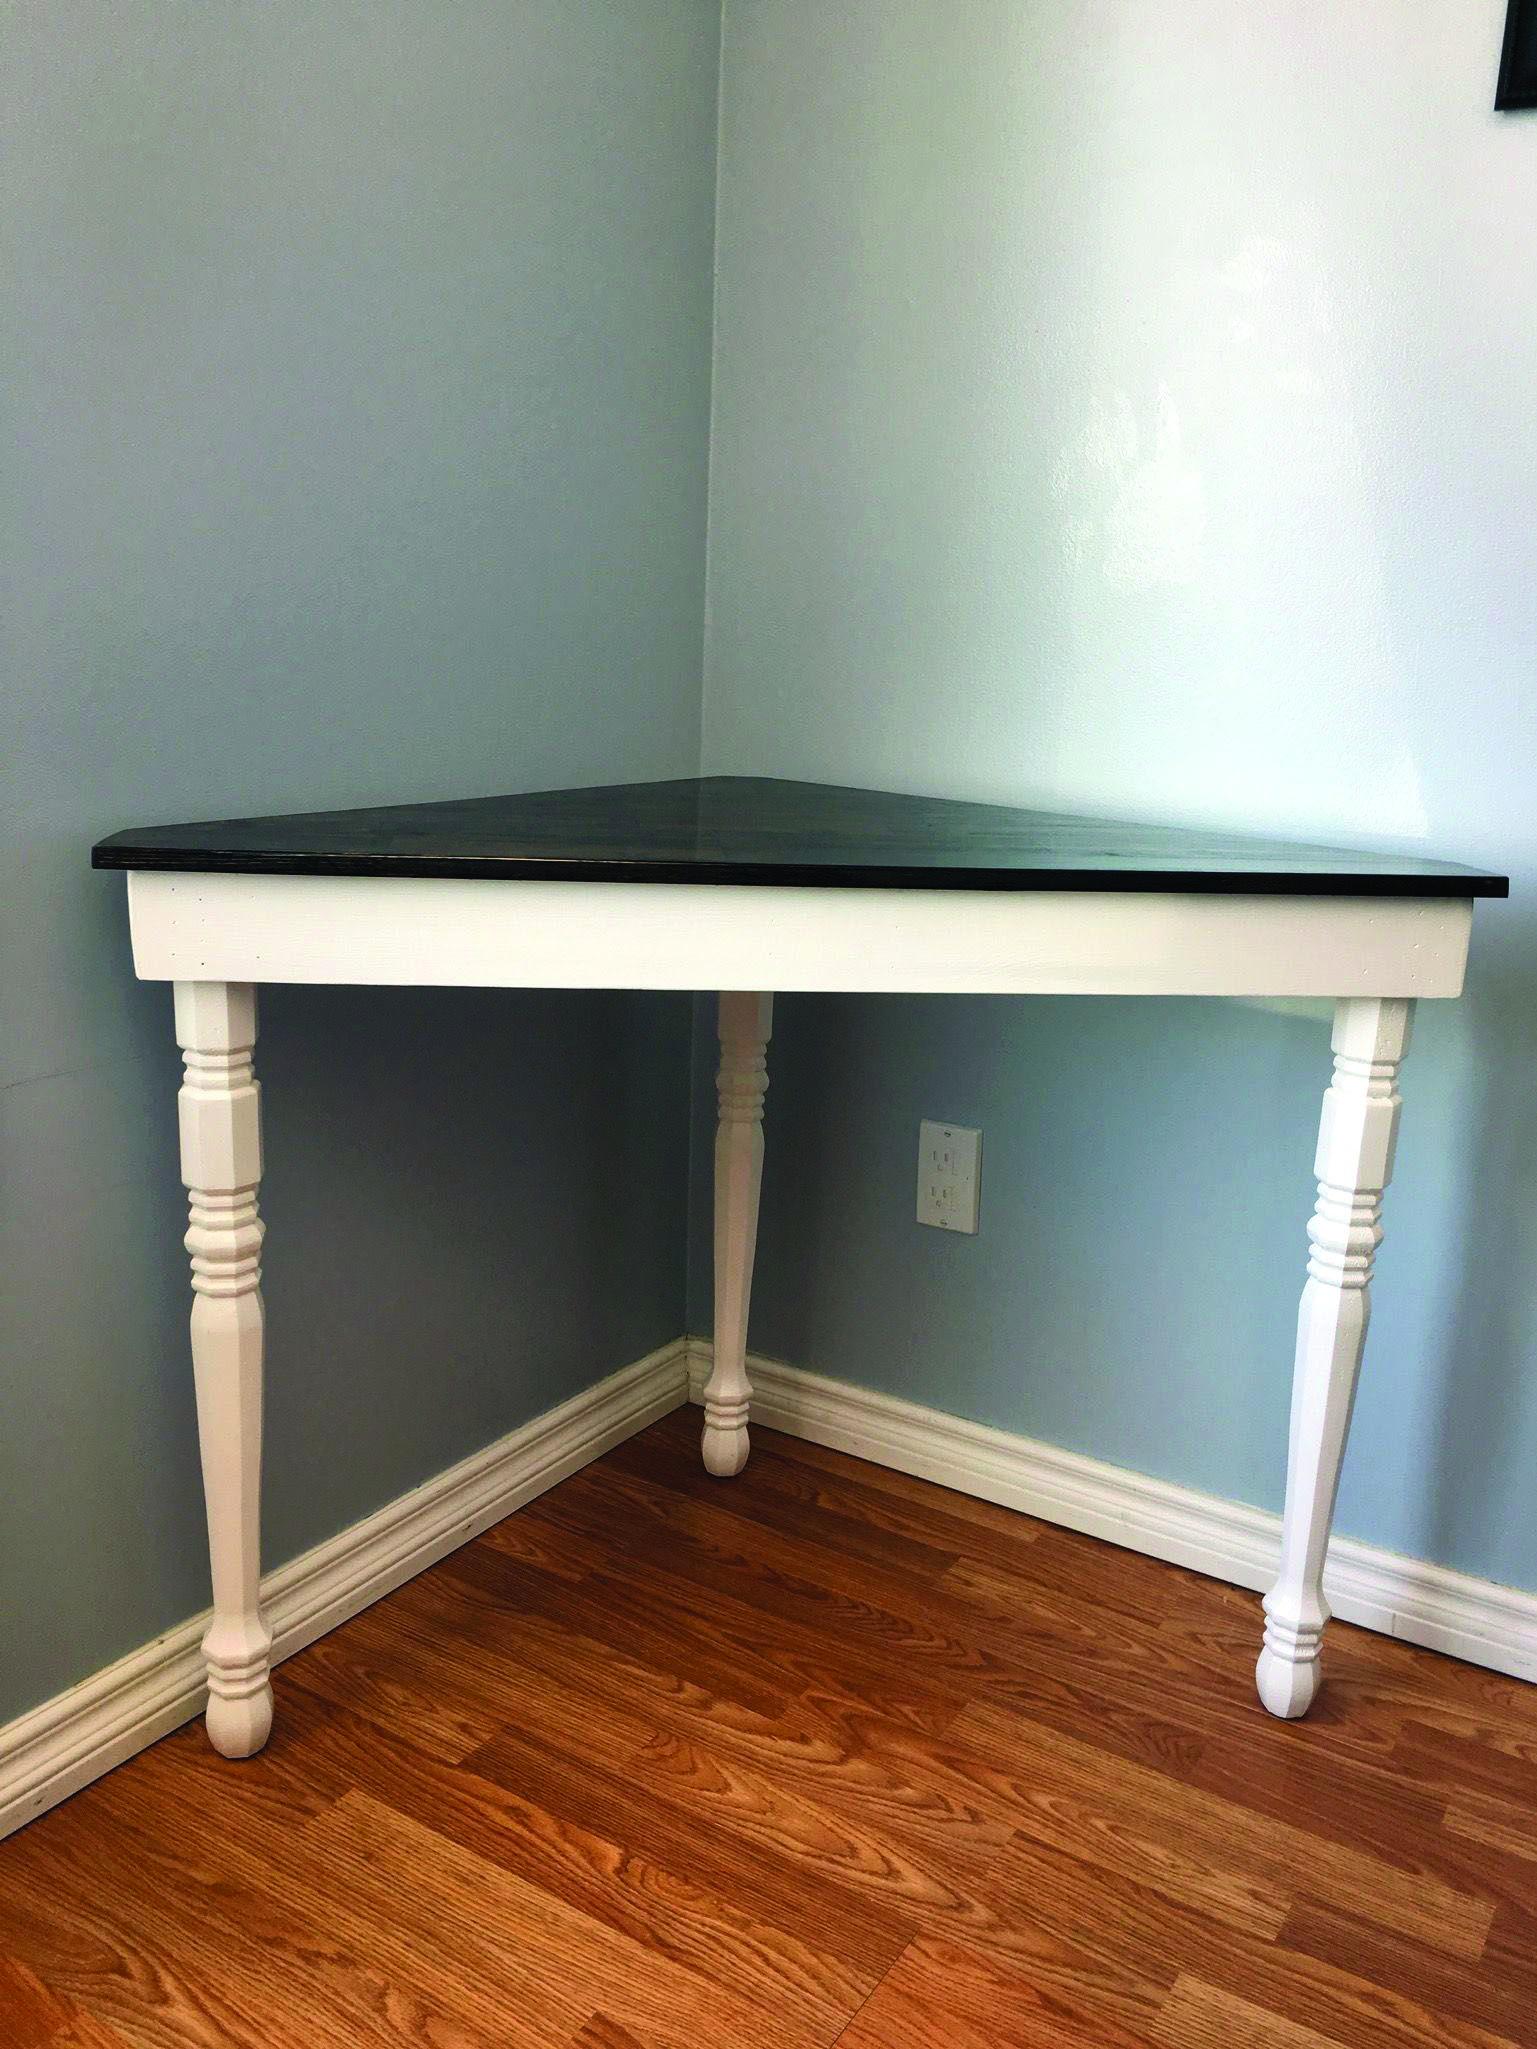 17 Diy Corner Desk Ideas To Build For Your Office Diy Computer